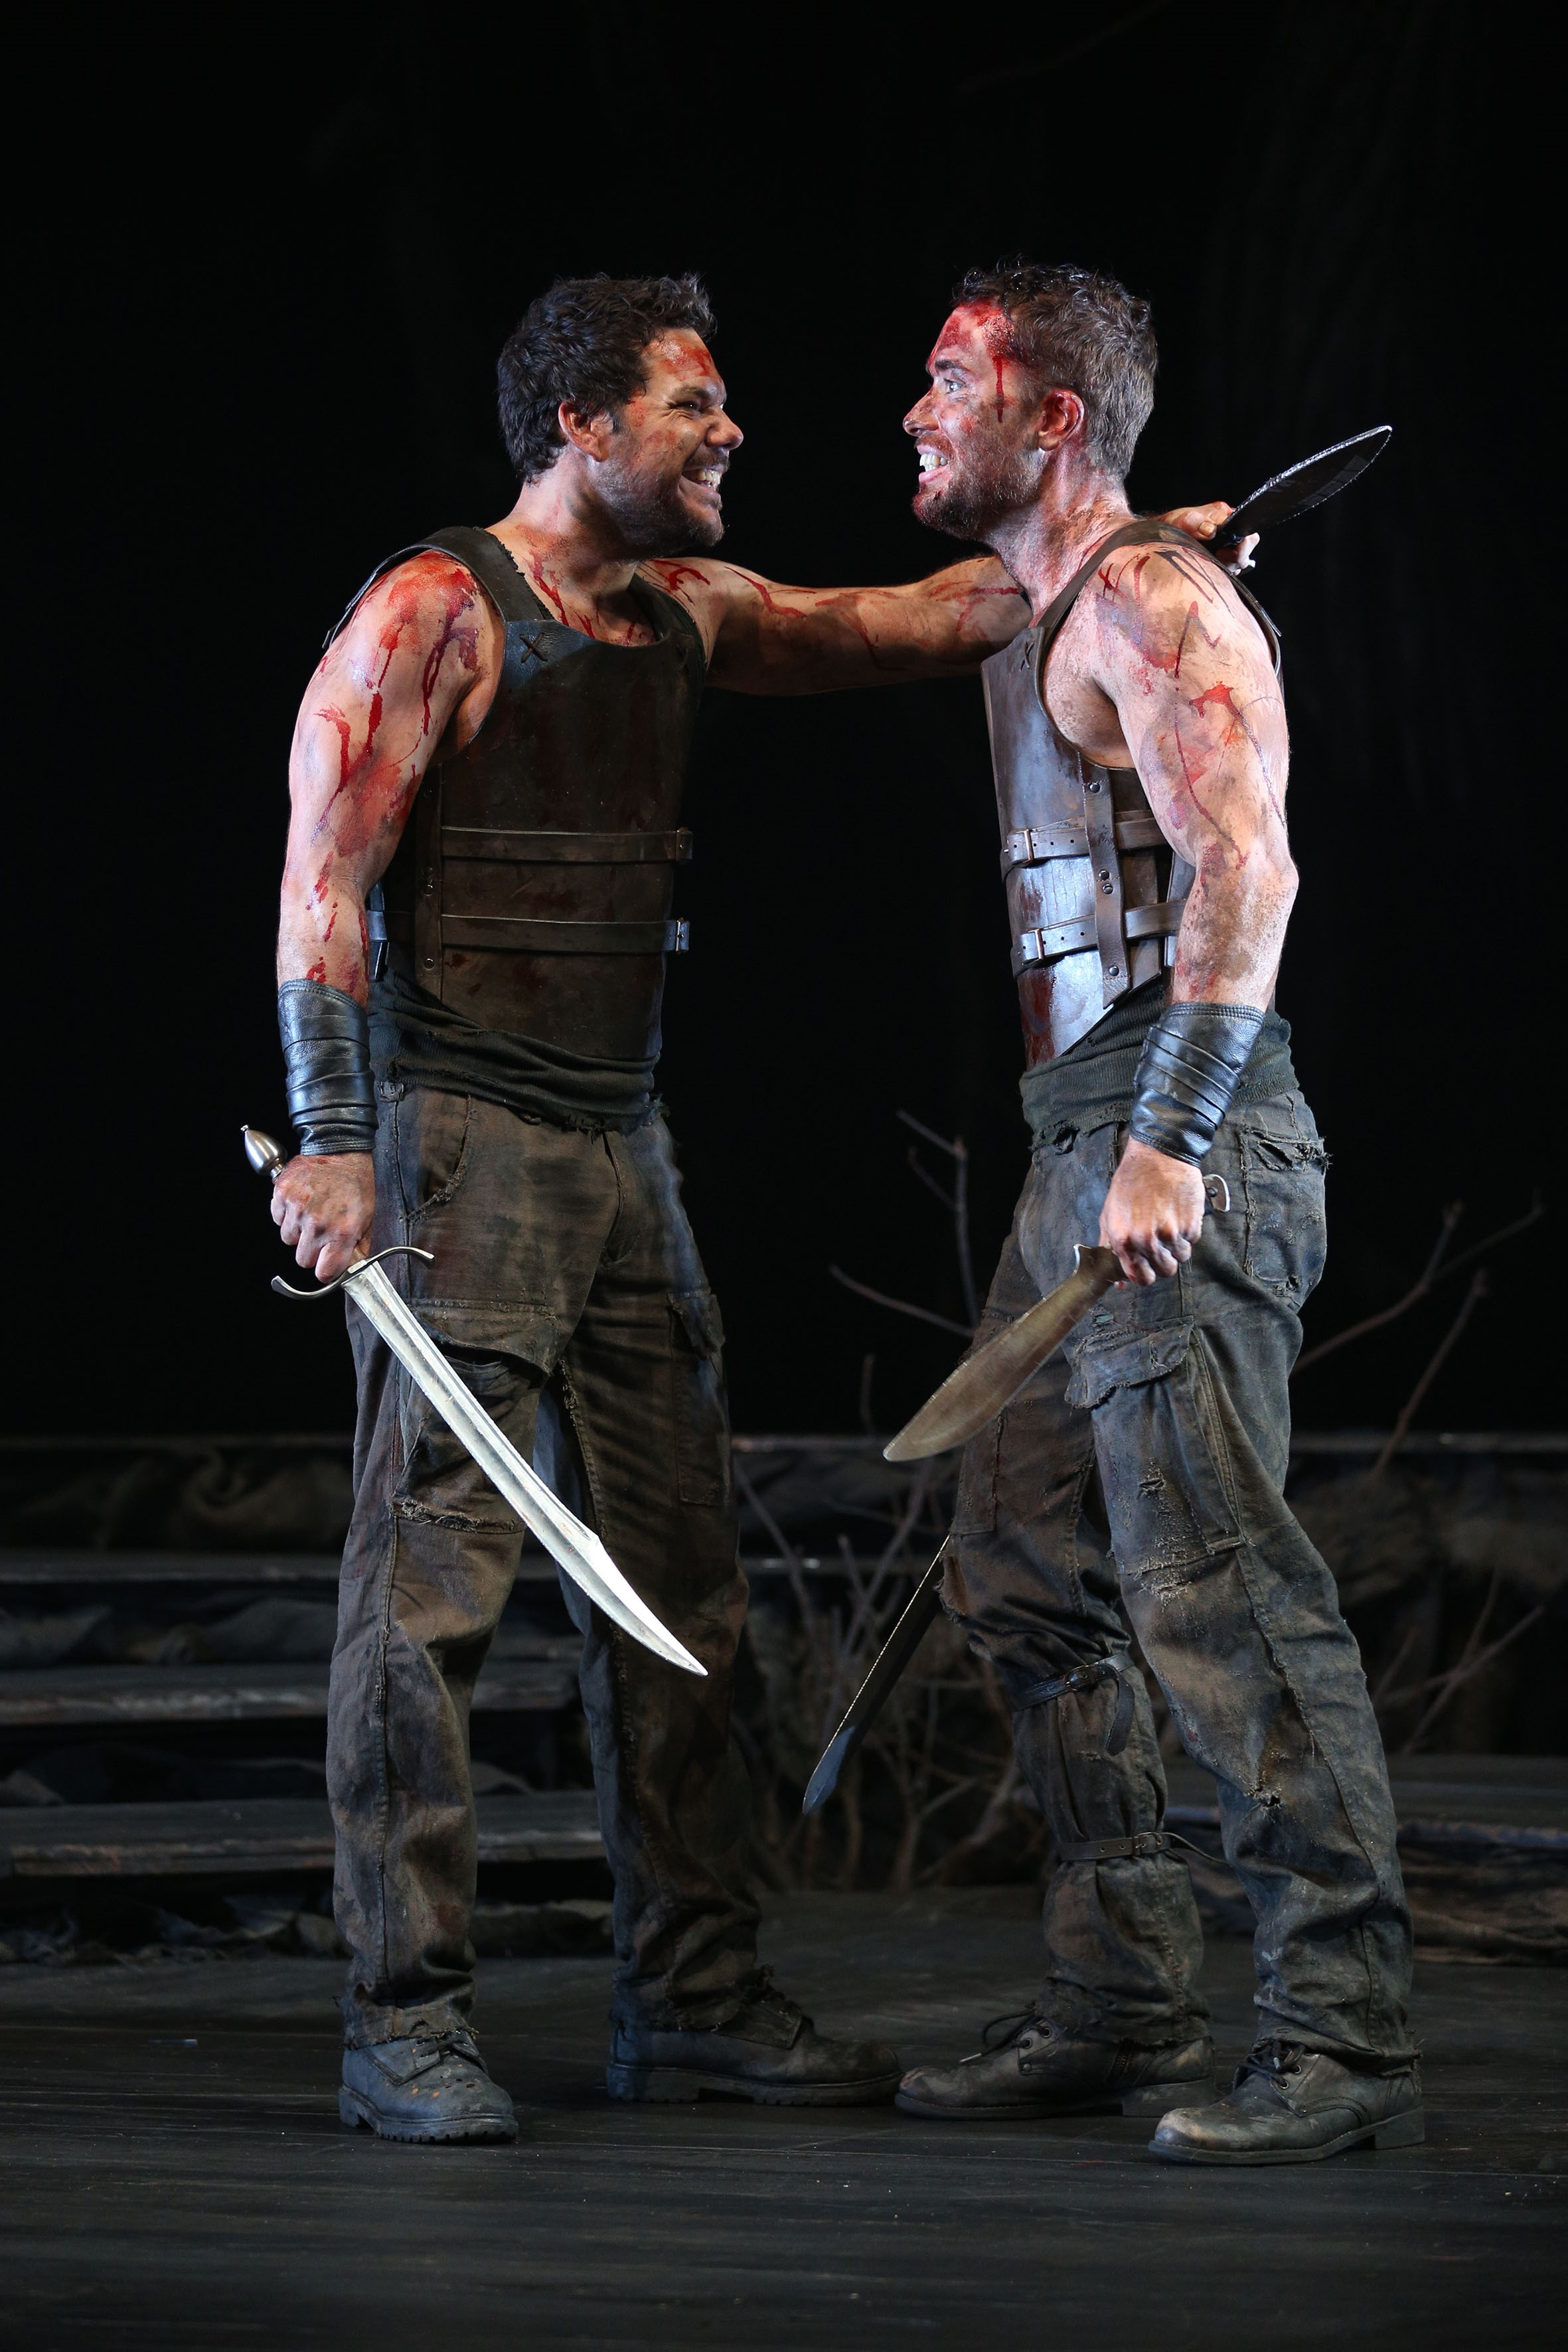 macbeth and banquo